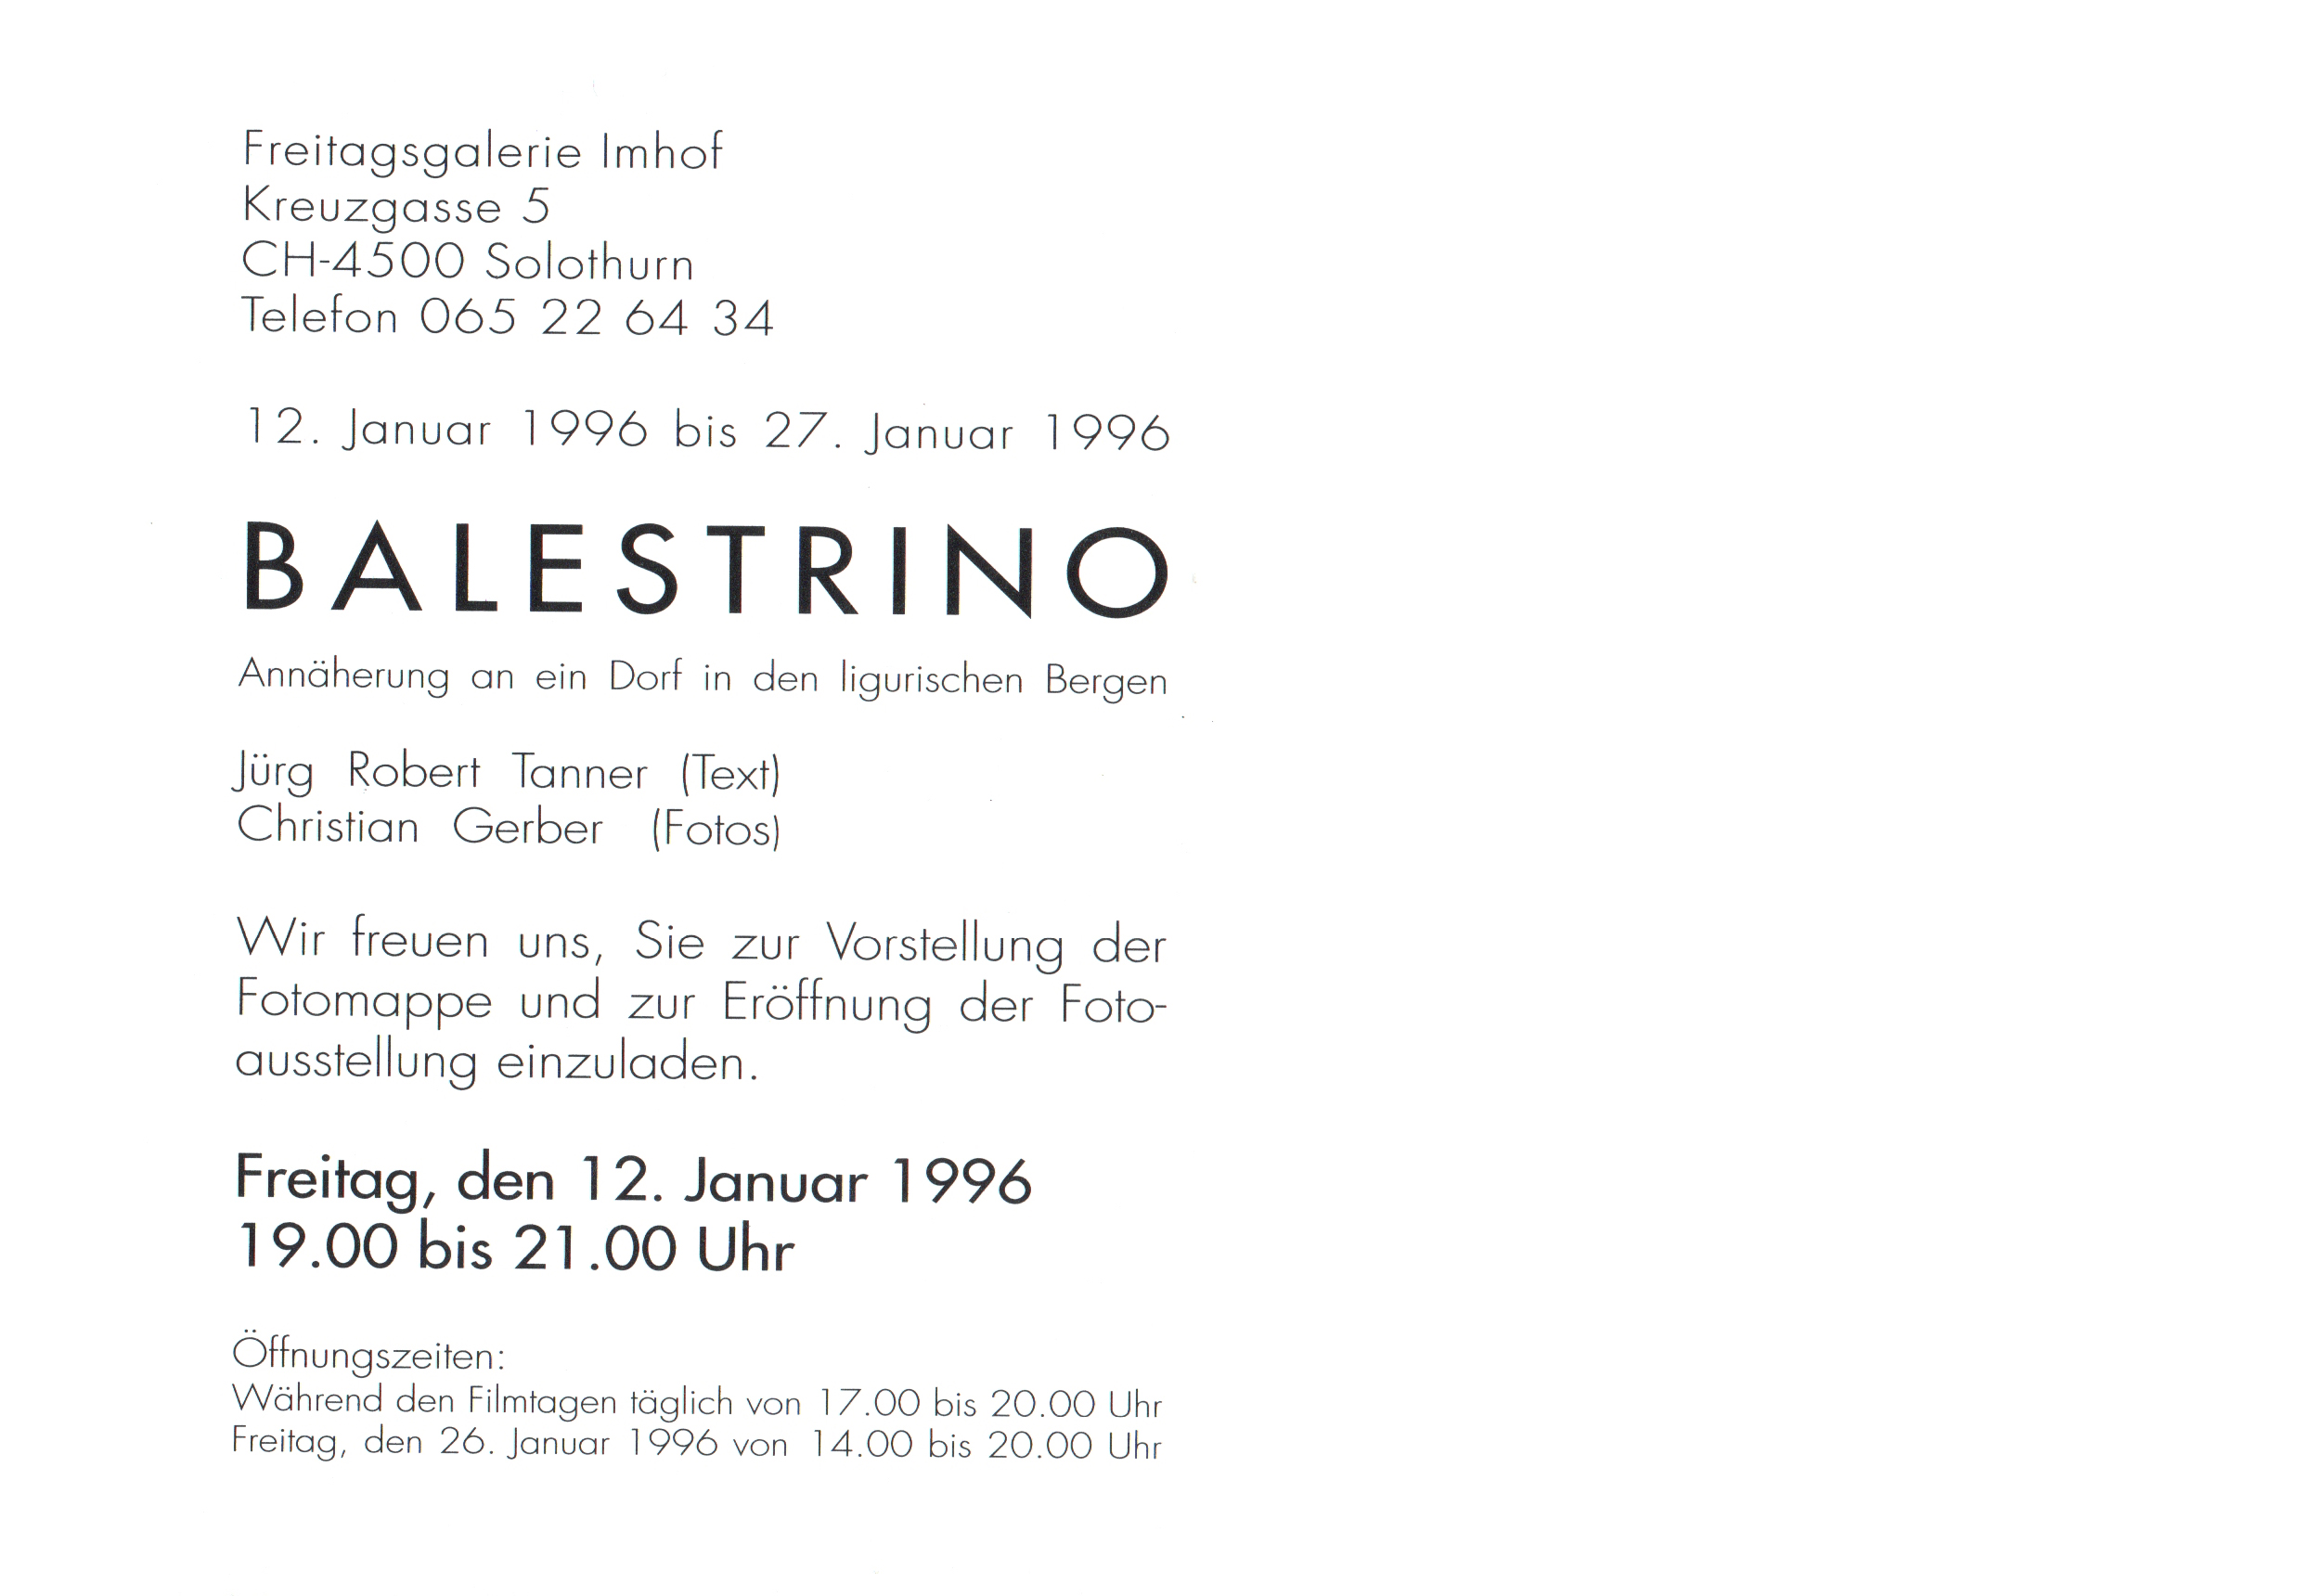 Balestrino Einladung004.jpg